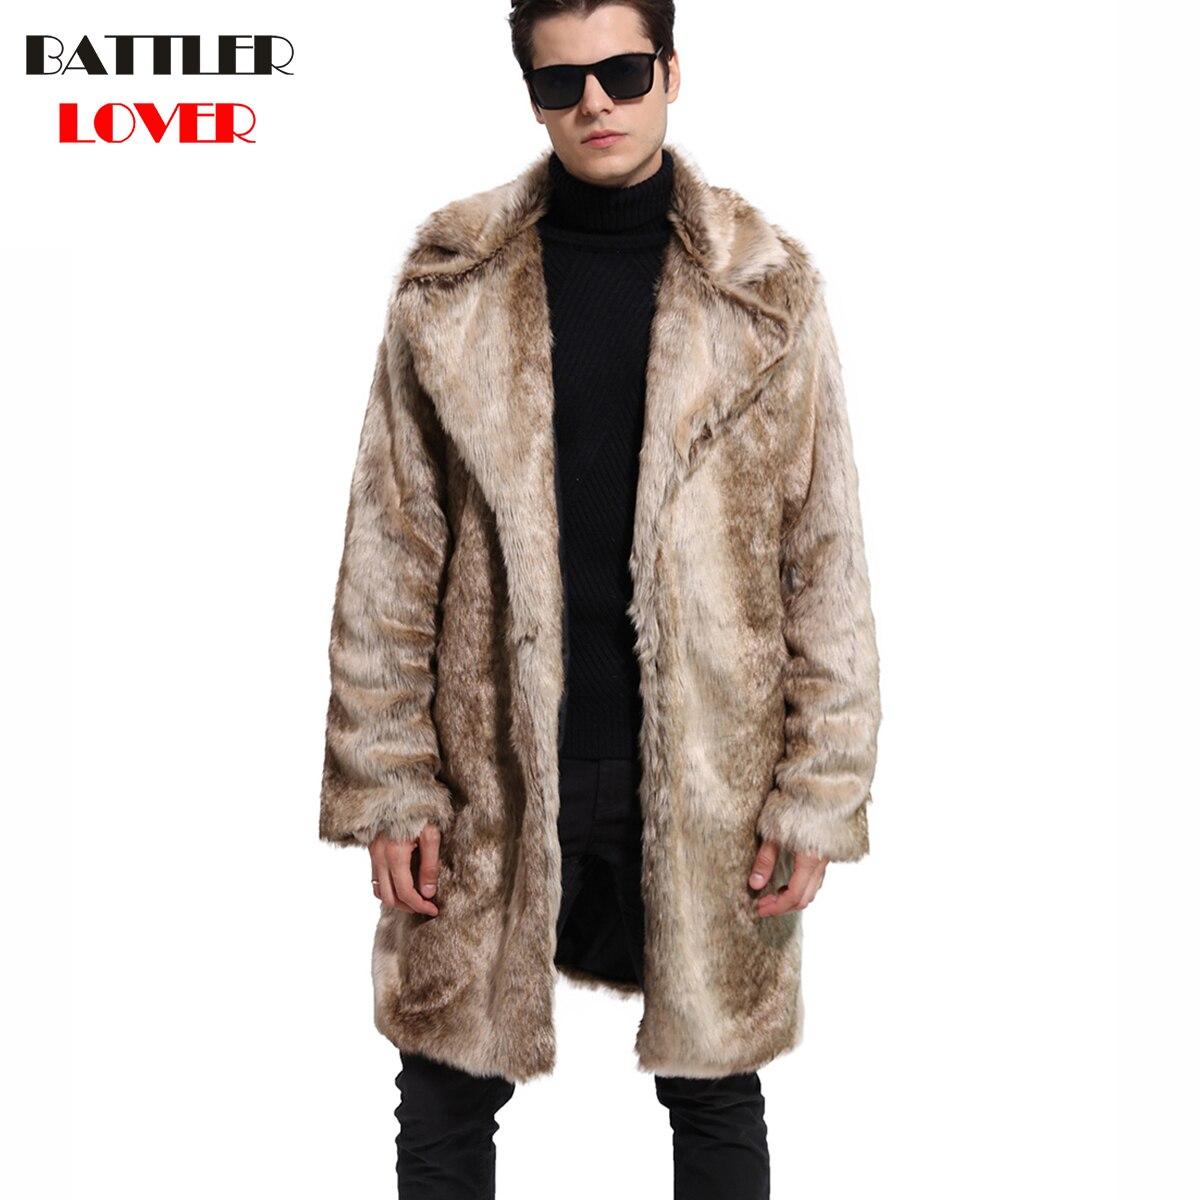 Mens Fur Coat Winter Faux Fur Warm Outwear Coats Men Punk Parka Jackets Hombre Thick Leather Overcoat Genuine Fur Brand Clothing